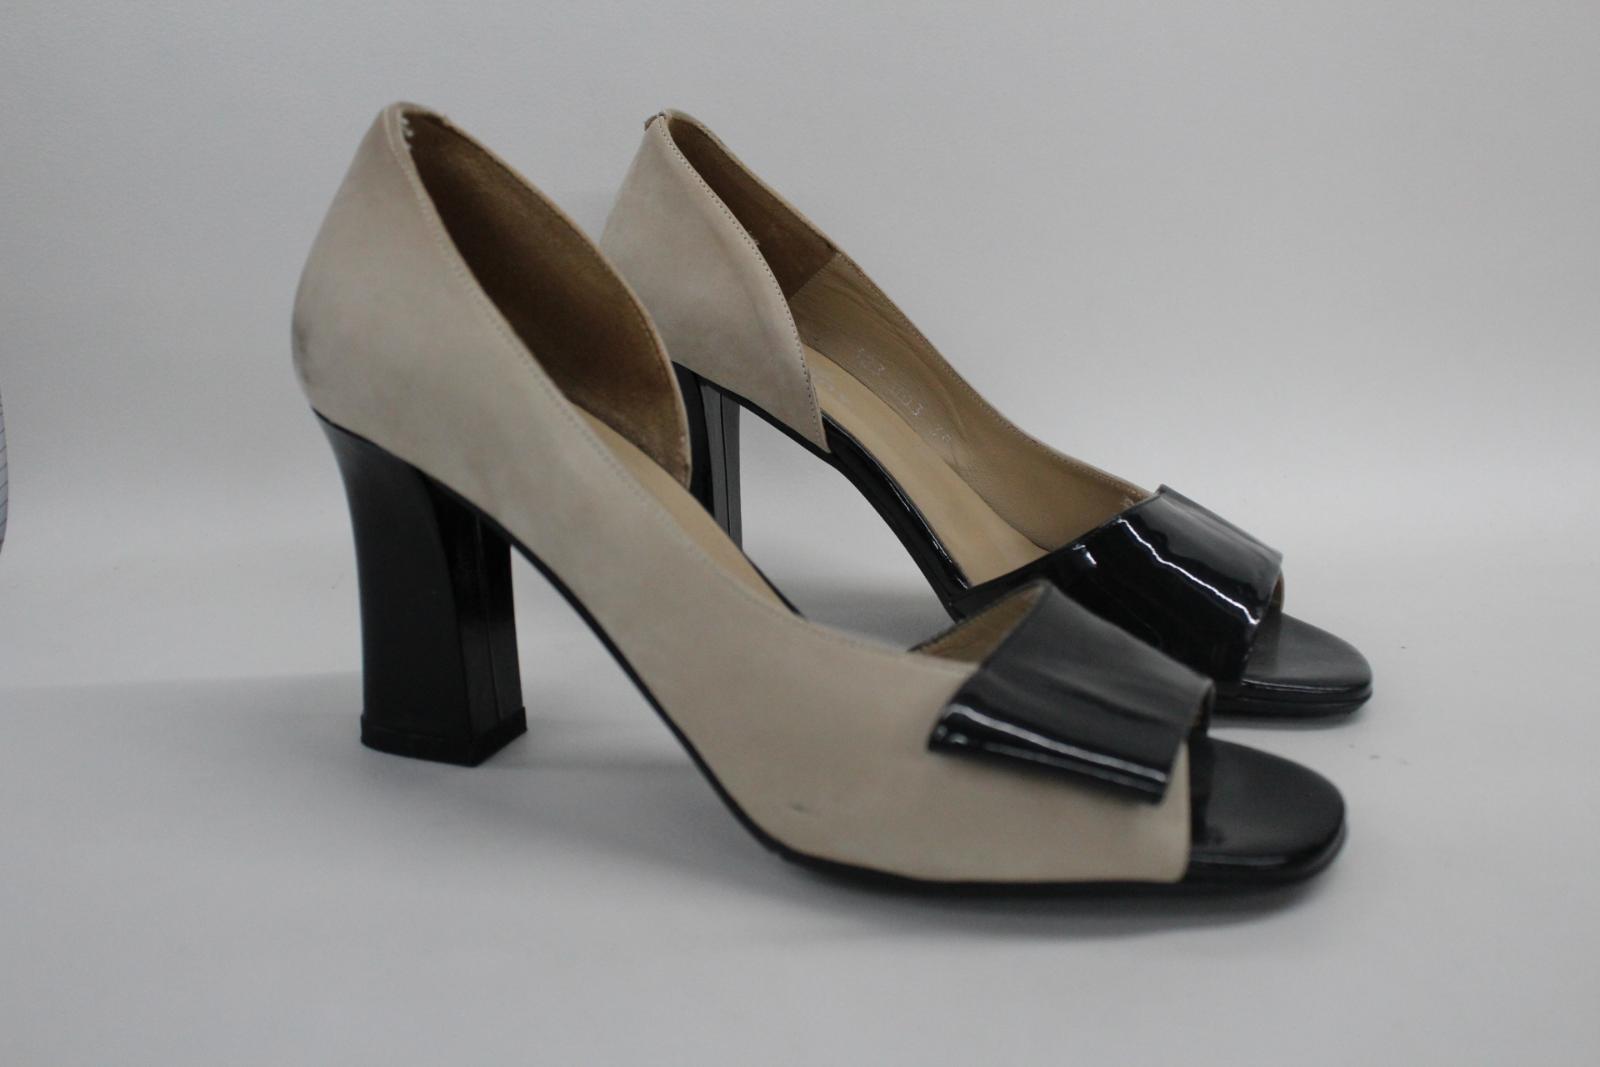 AUDLEY-London-Beige-Leather-Open-Peep-Toe-Bloc-Heel-Court-Shoes-EU39-UK6 thumbnail 12